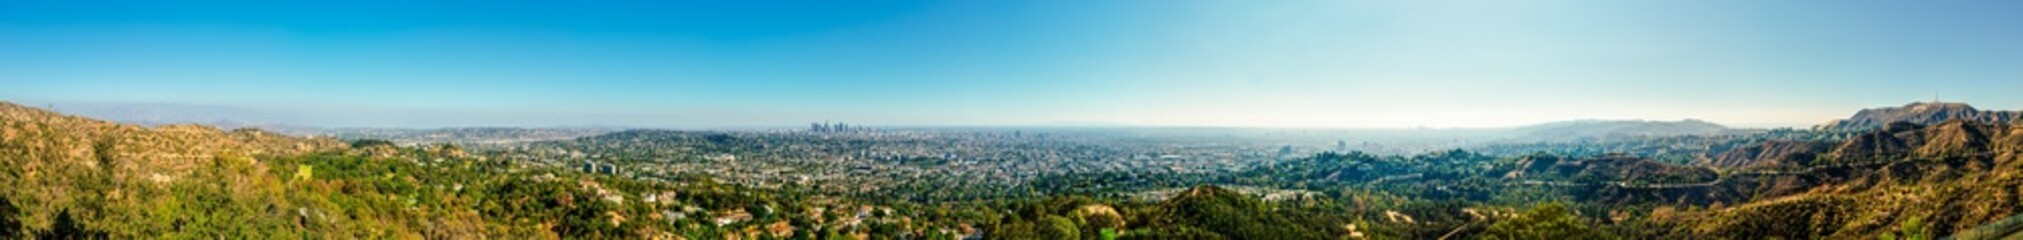 Panorama Los Angeles - Hollywood Hills